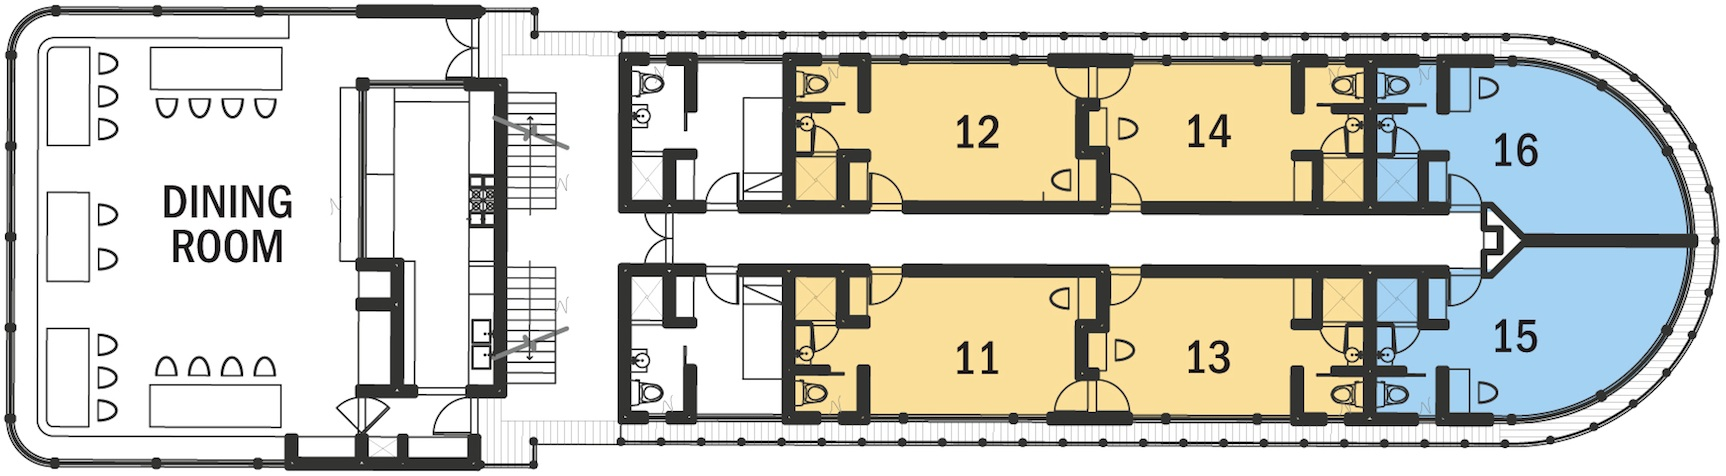 Lindblad Expeditions Delfin II Deckplans Upper Deck.jpg